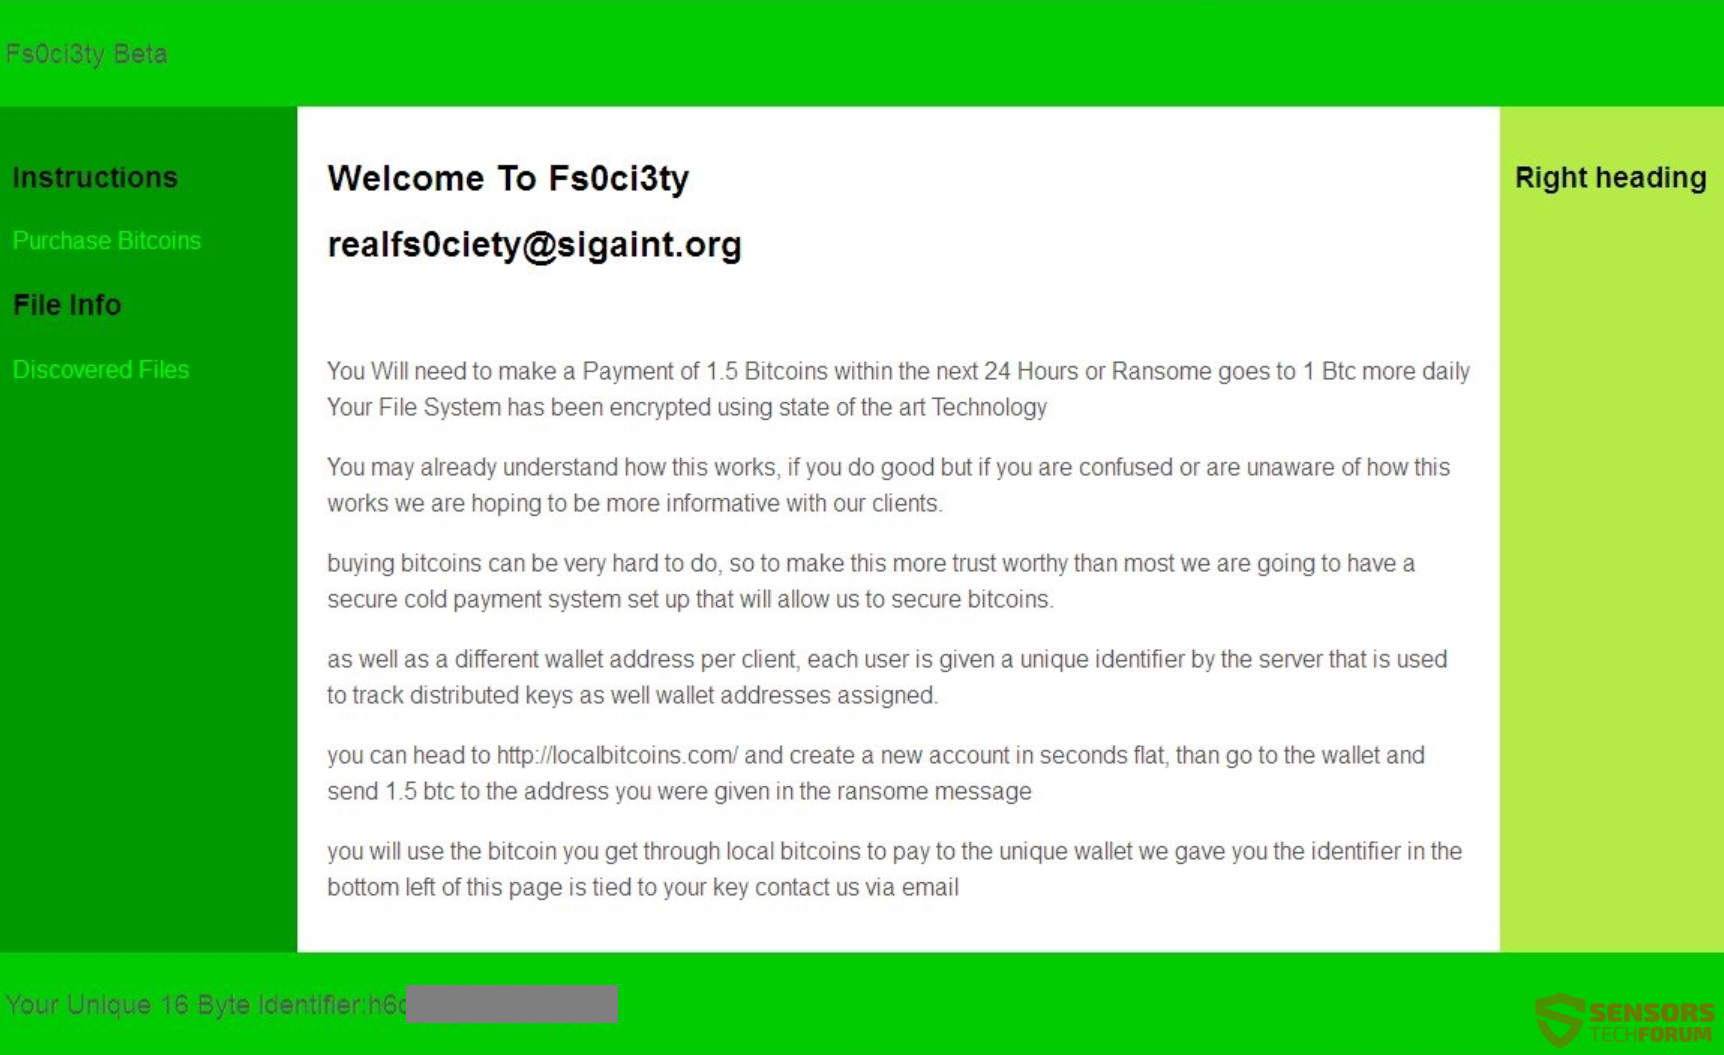 stf-fs0ci3ty-ransomware-fsociety-virus-ransom-note-instructions